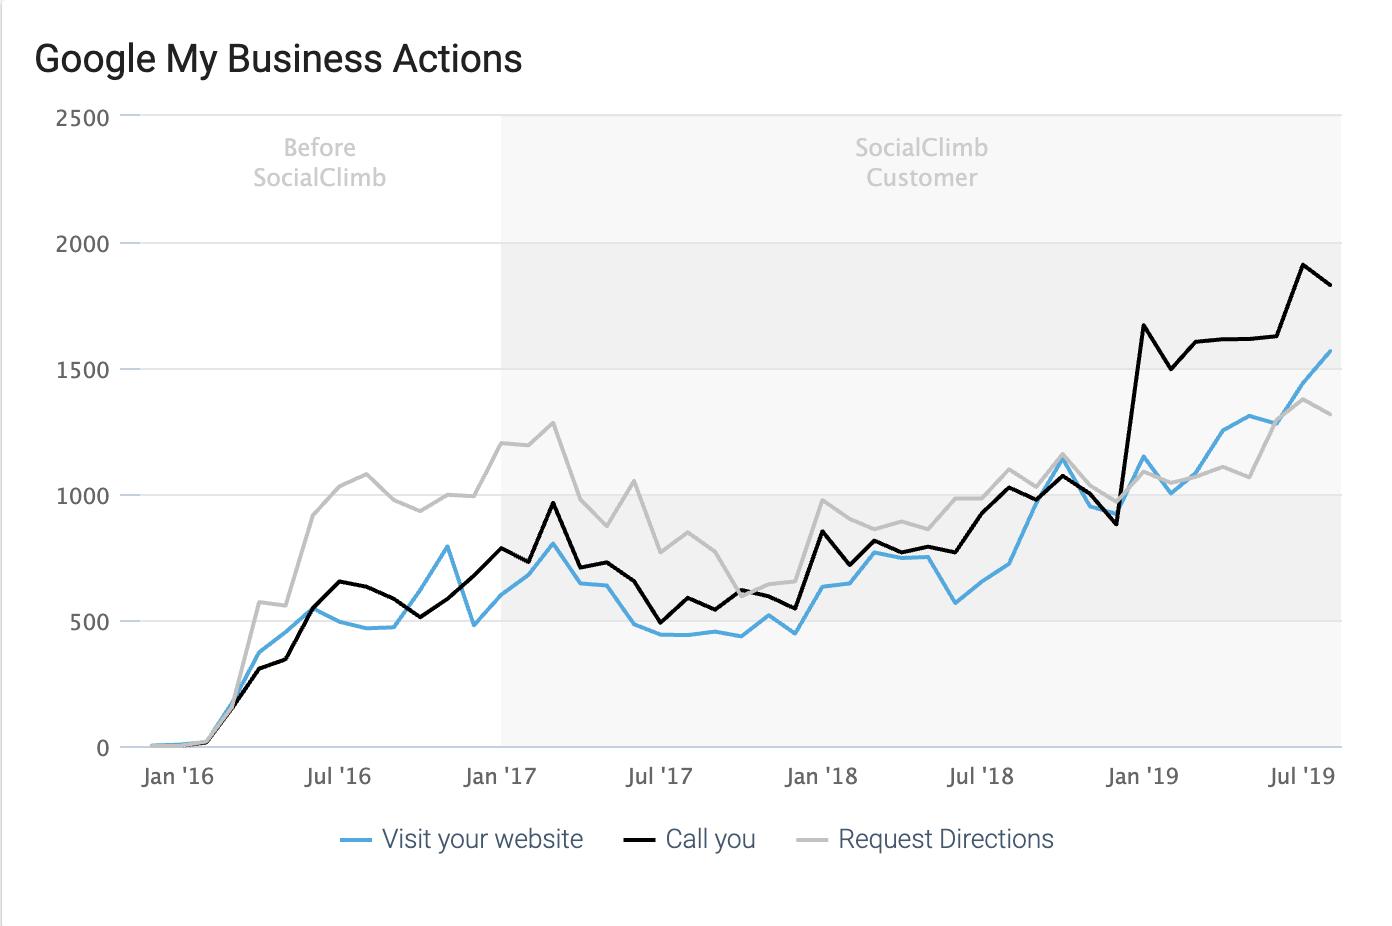 GMB measurable actions provide marketing metrics that inform ROI.